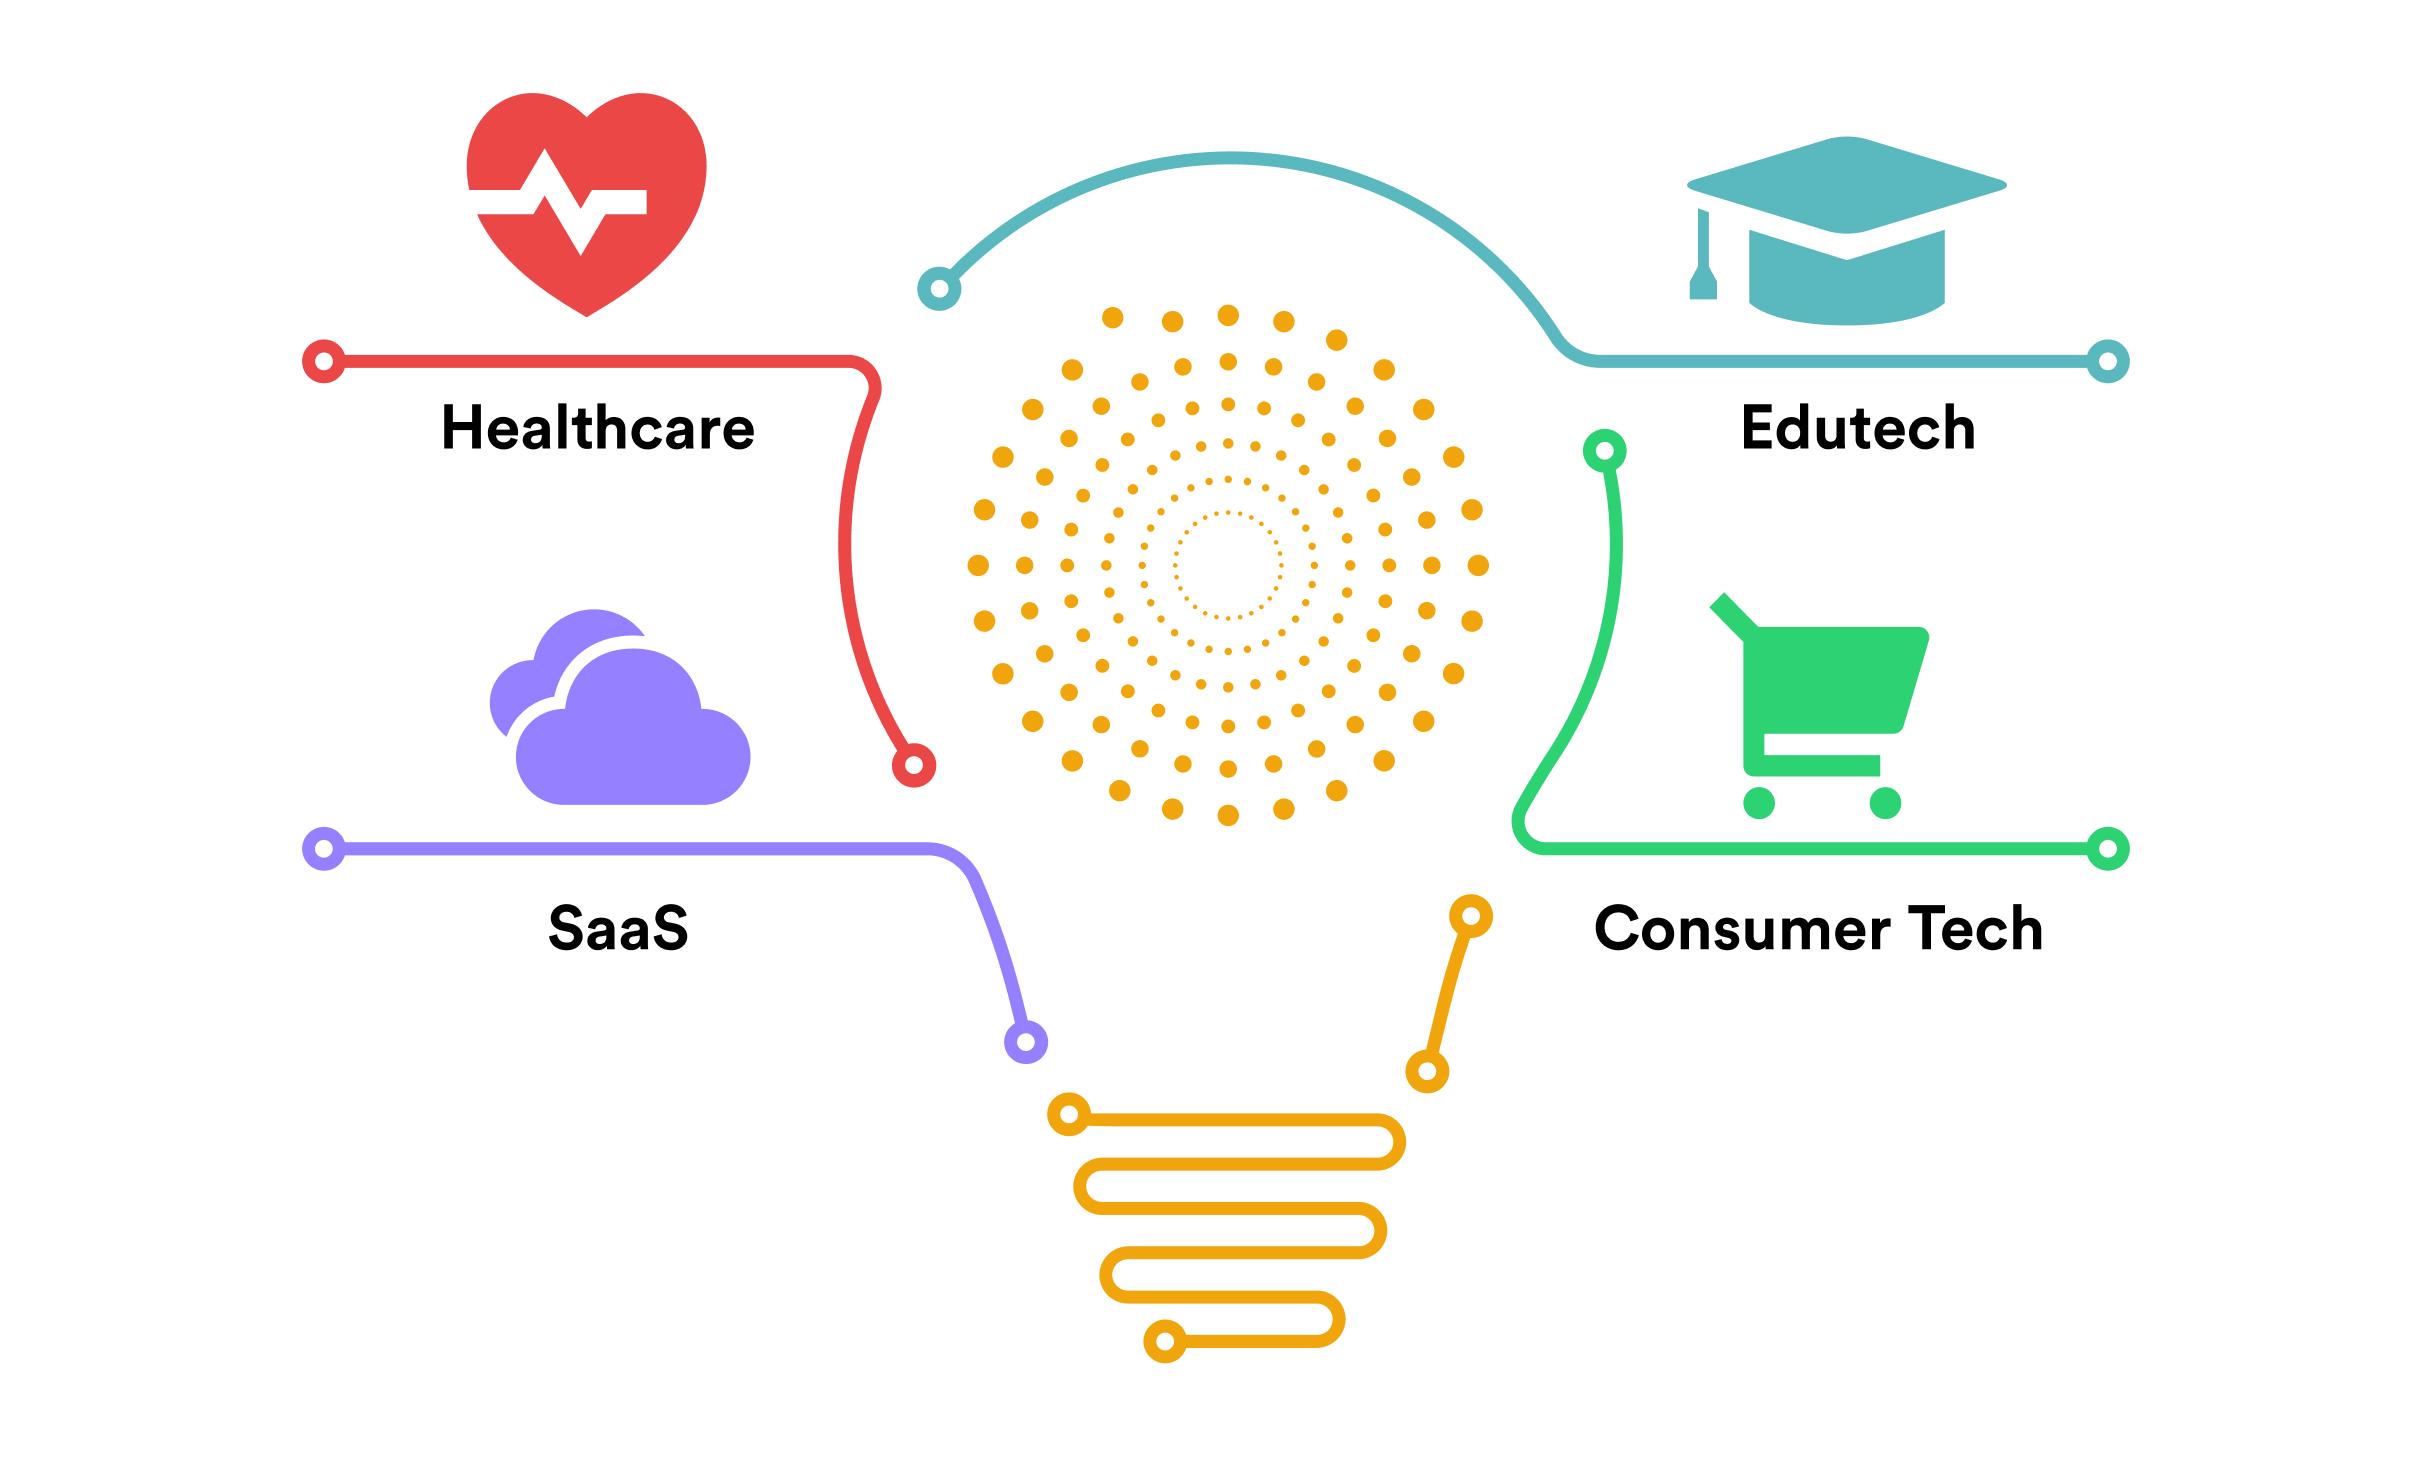 10 Interesting hackathon ideas for 2021